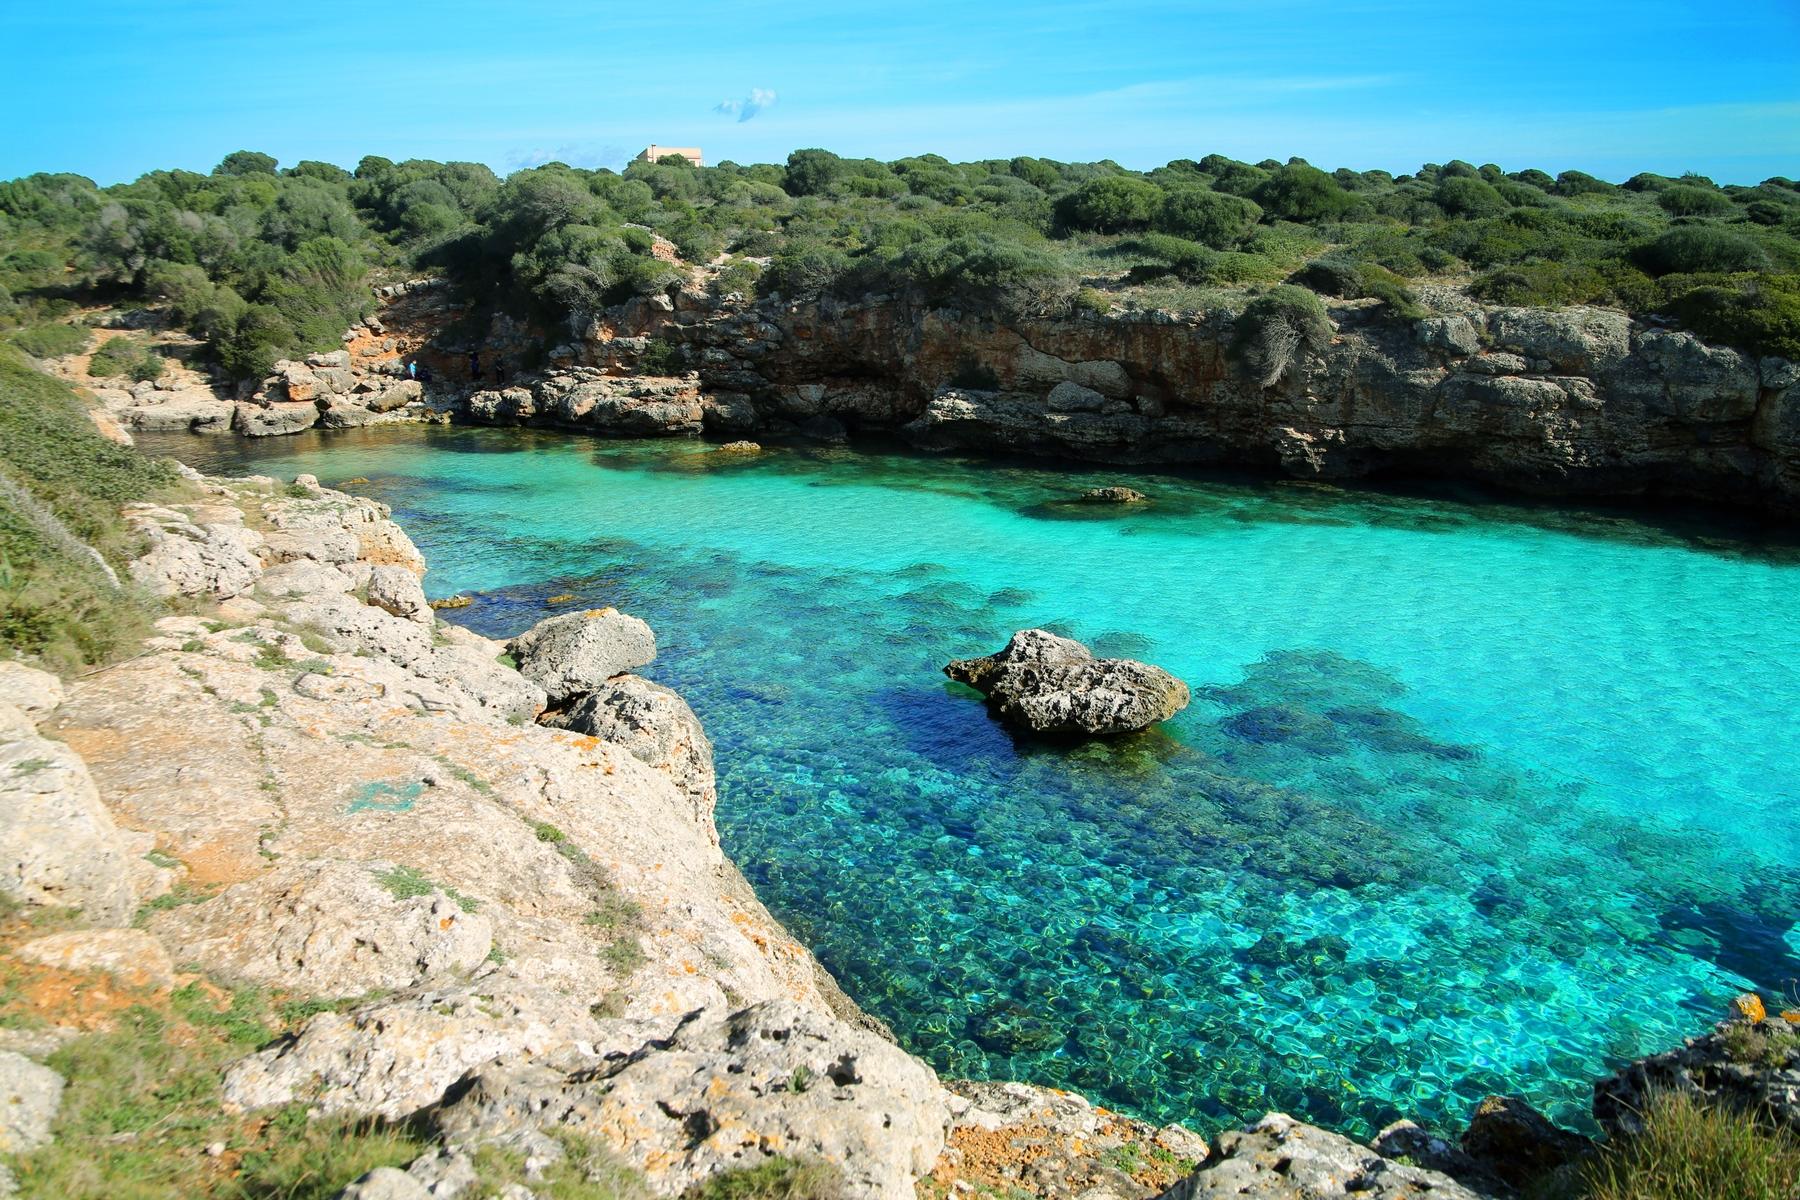 Majorca, Cala Petita, a hidden little bay with turquoise water